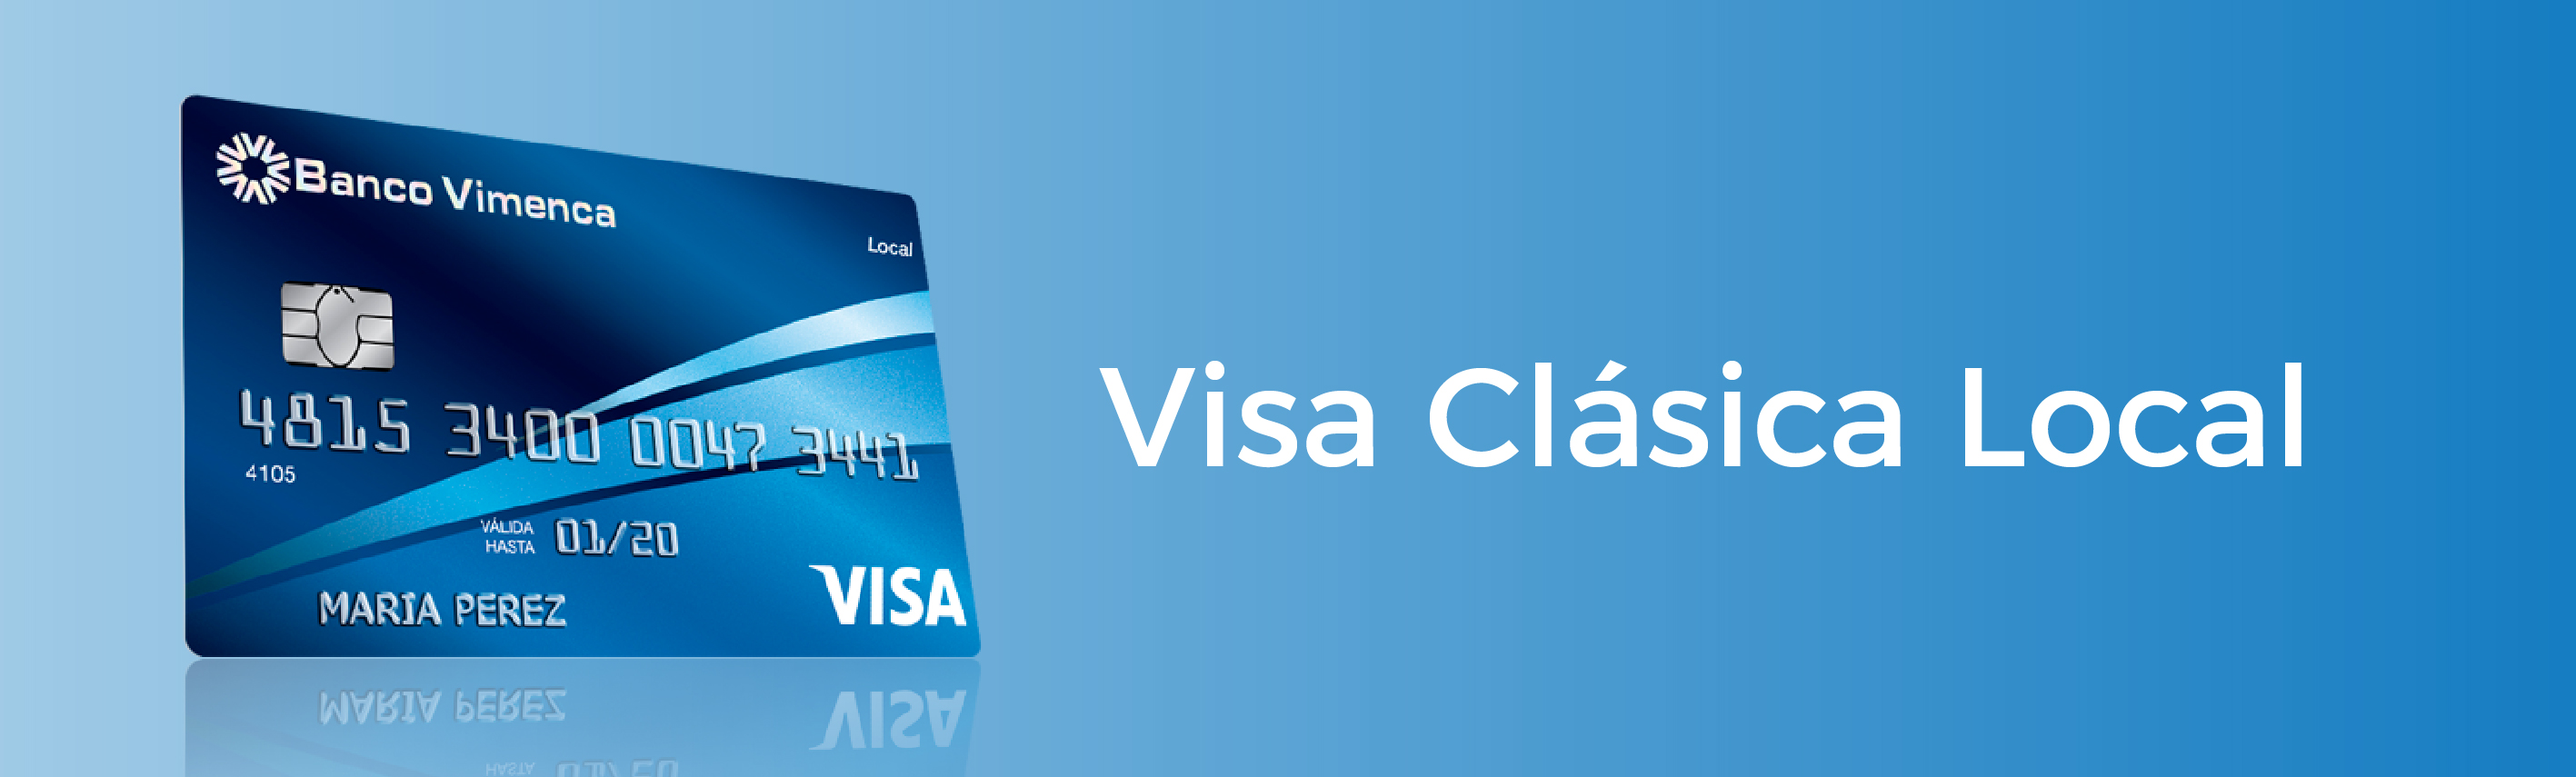 Tarjeta de Crédito Visa Clásica Local